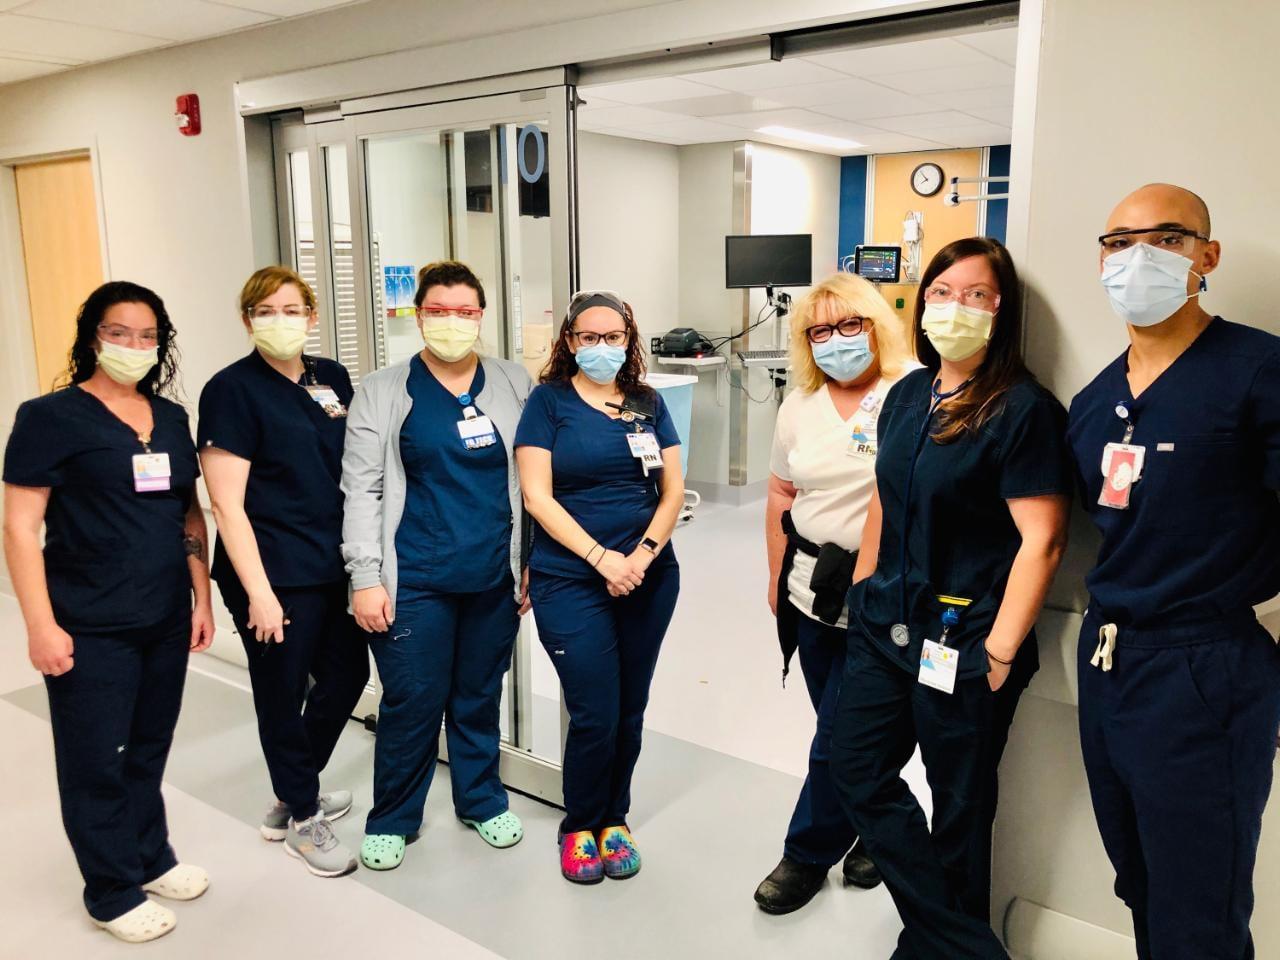 arnot-health-employees.jpg